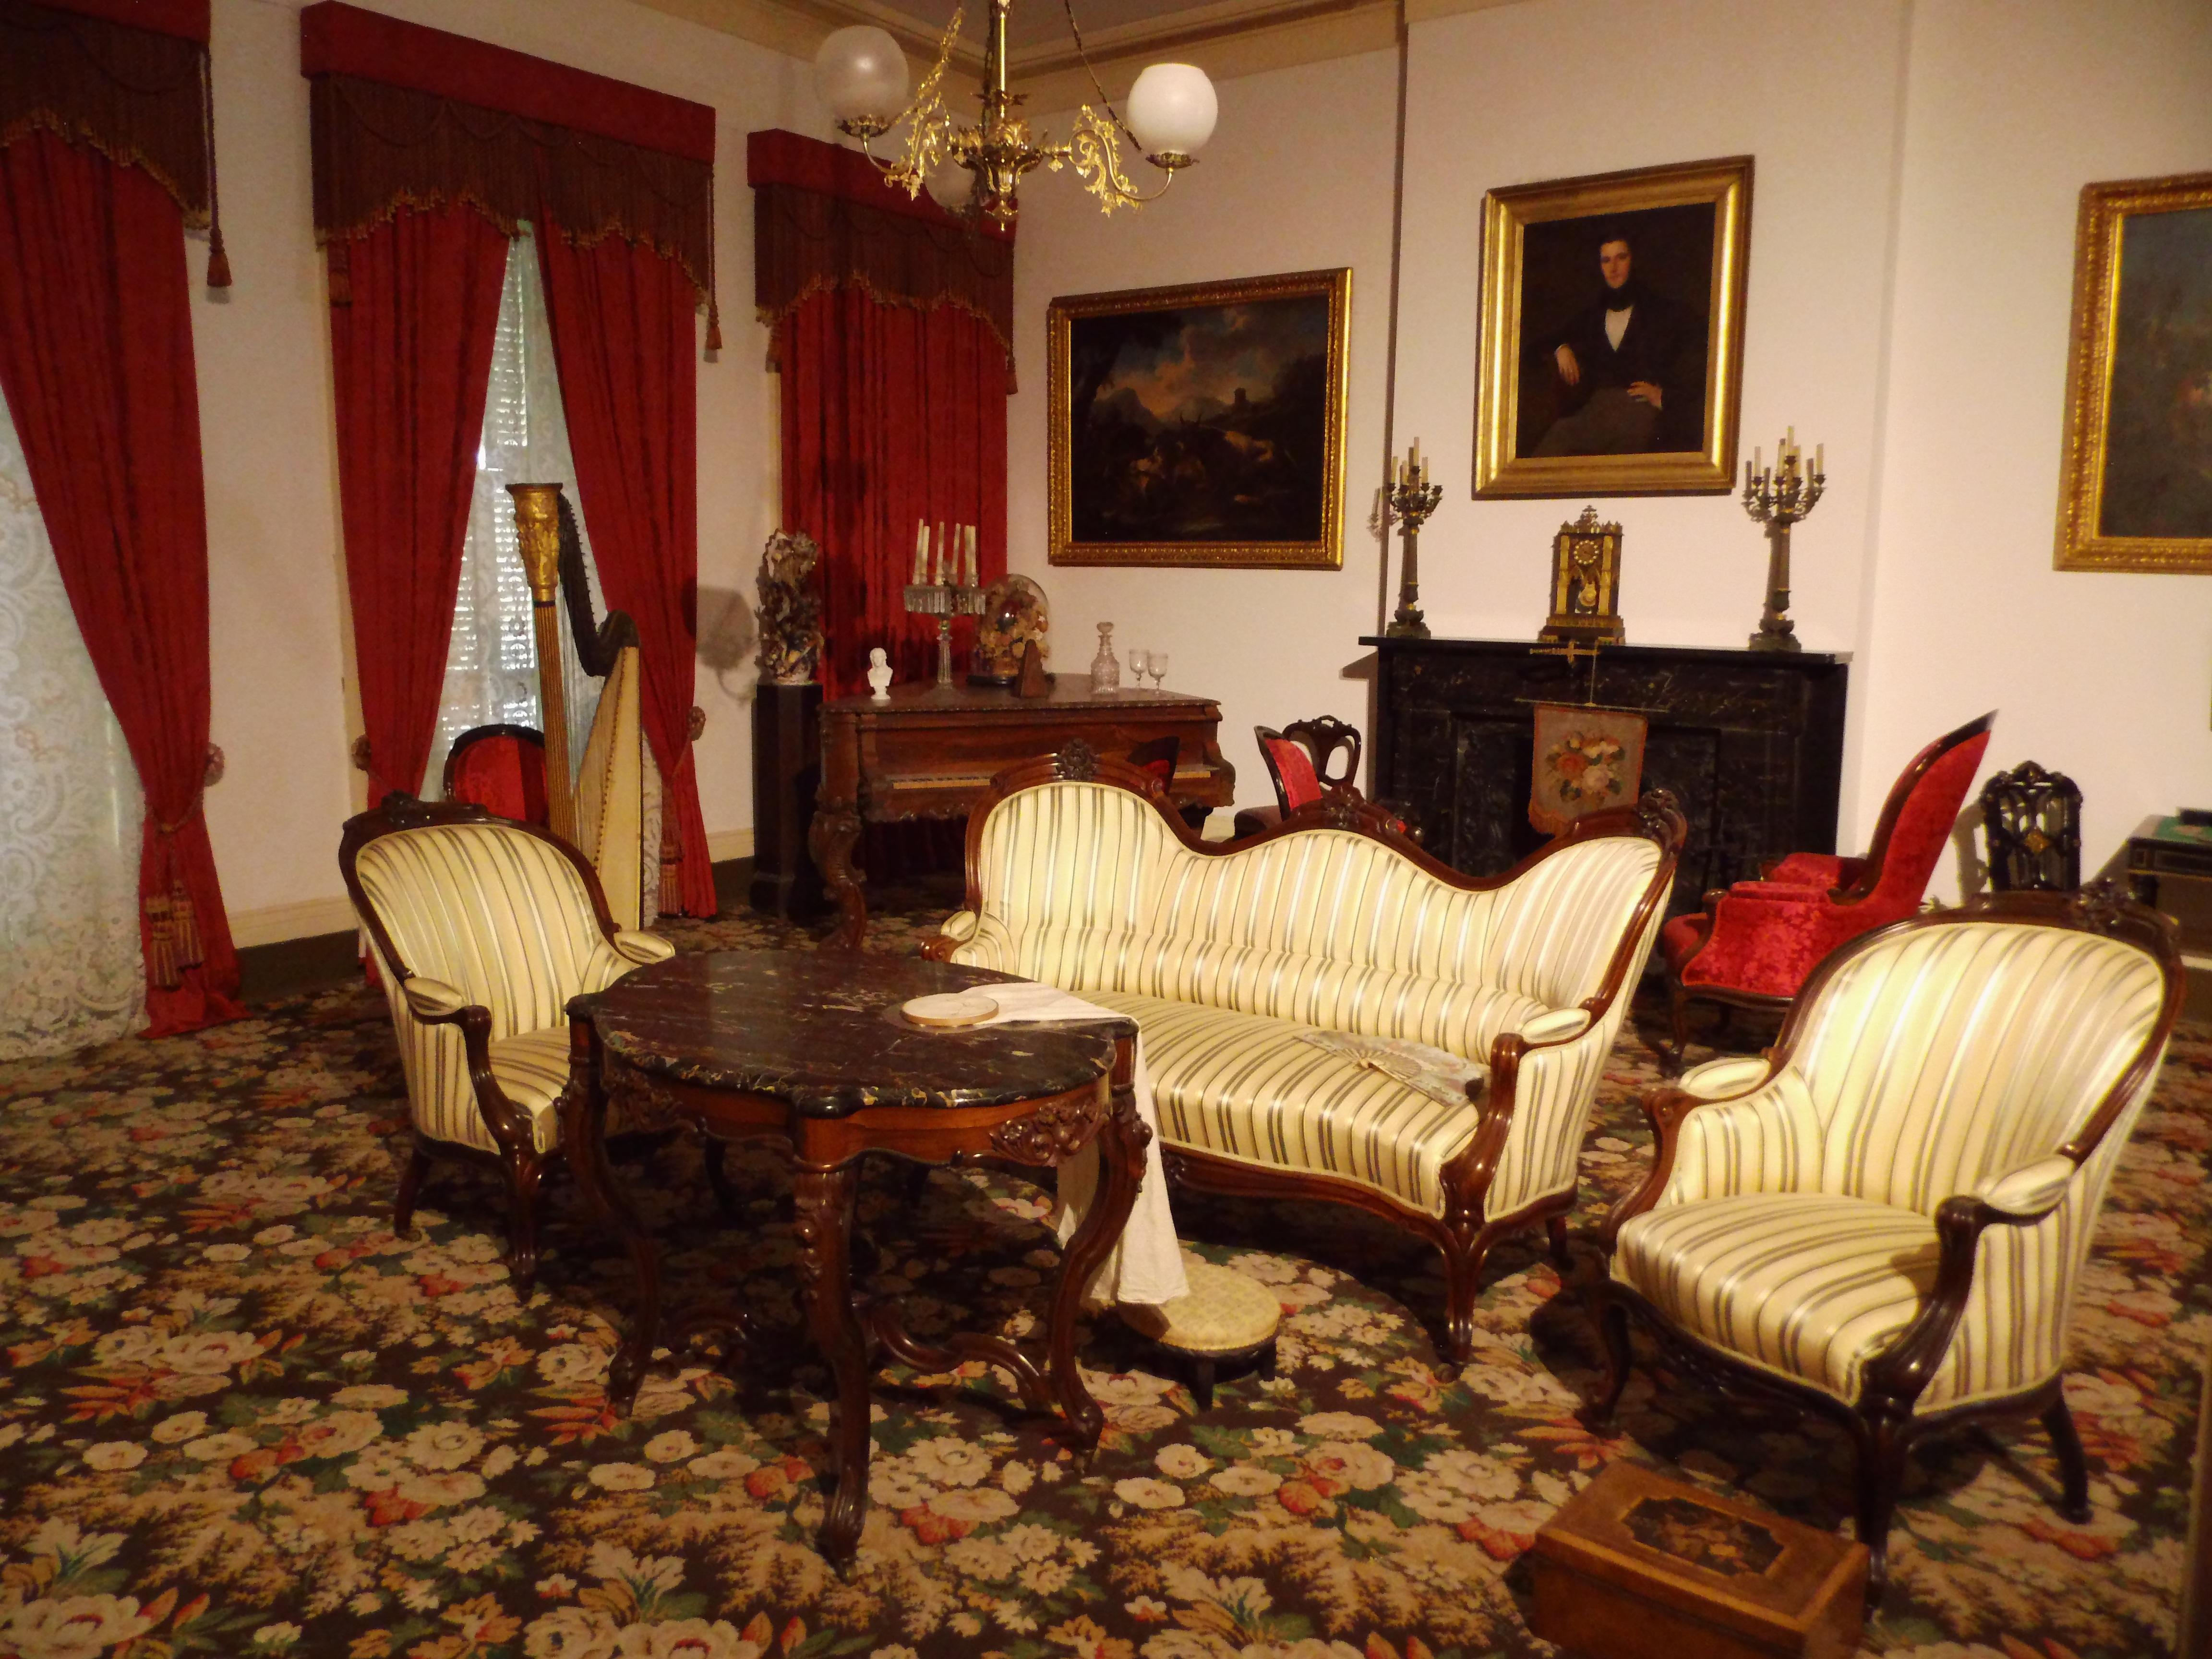 Gambar Antik Vila Rumah Besar Pedalaman Tua Museum Pondok